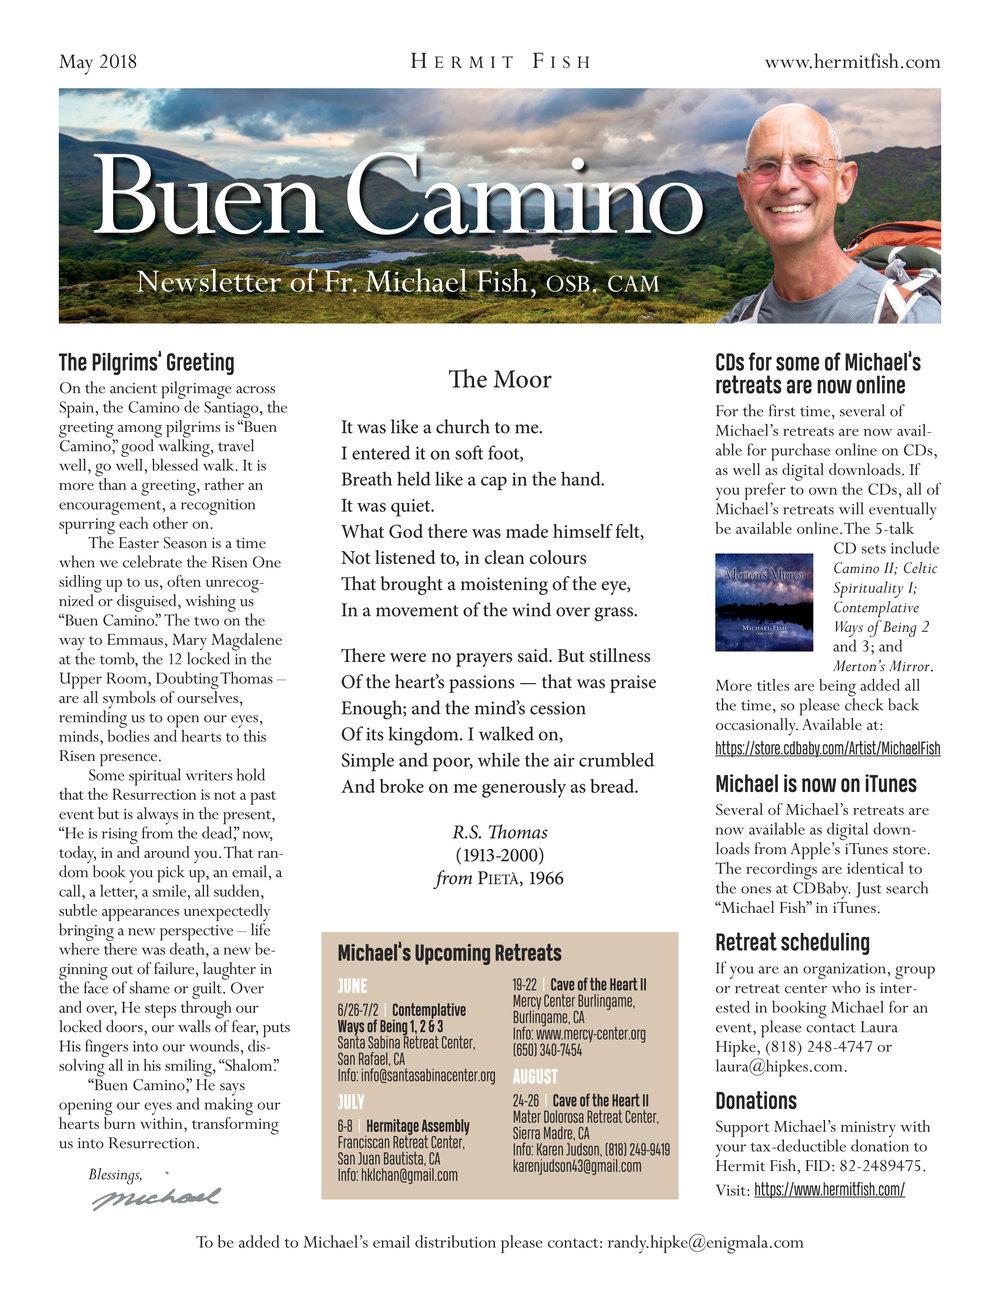 Buen Camino May 2018.jpg